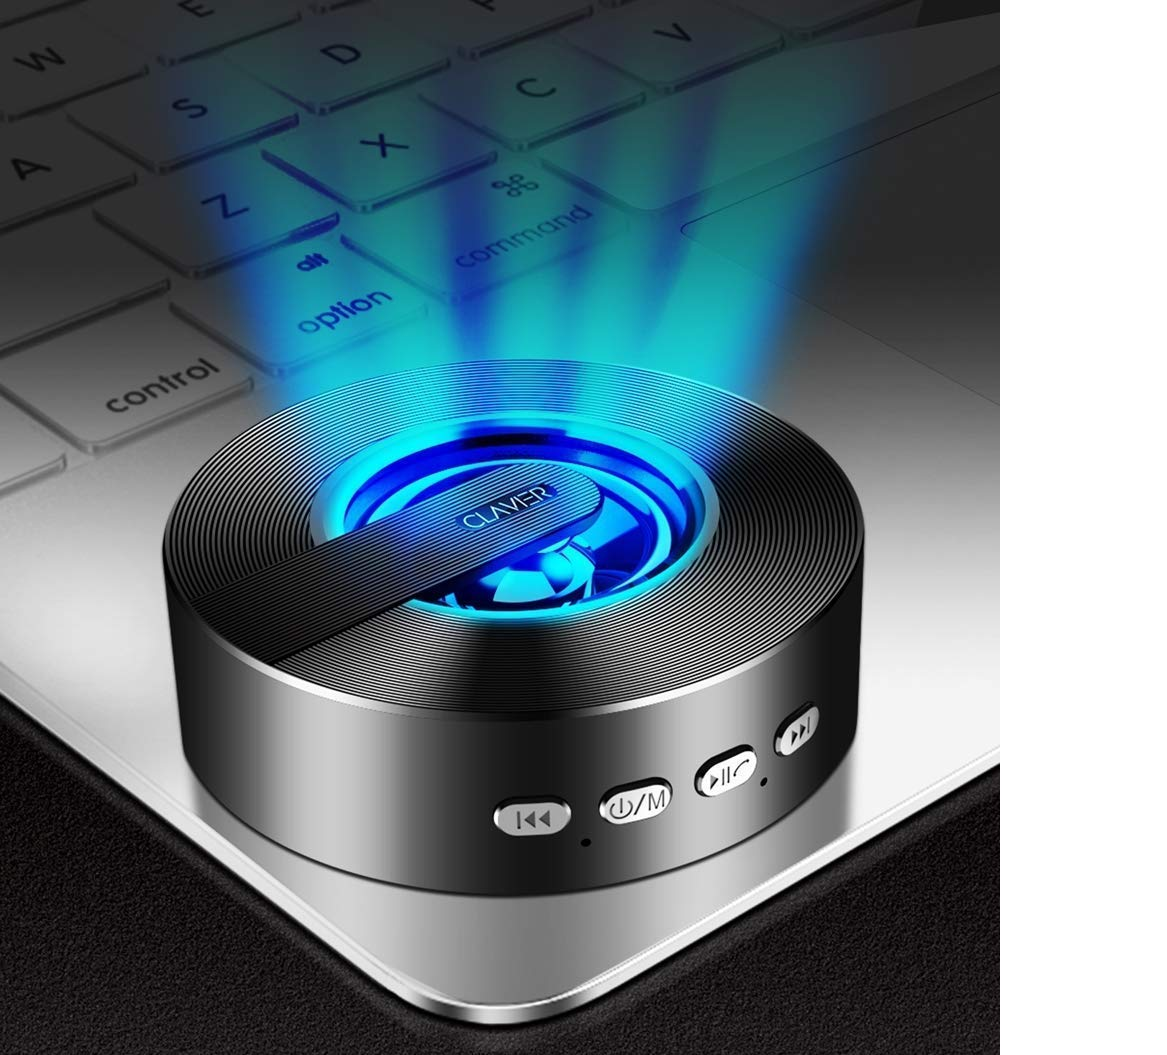 Clavier Pluto Portable Bluetooth Speaker